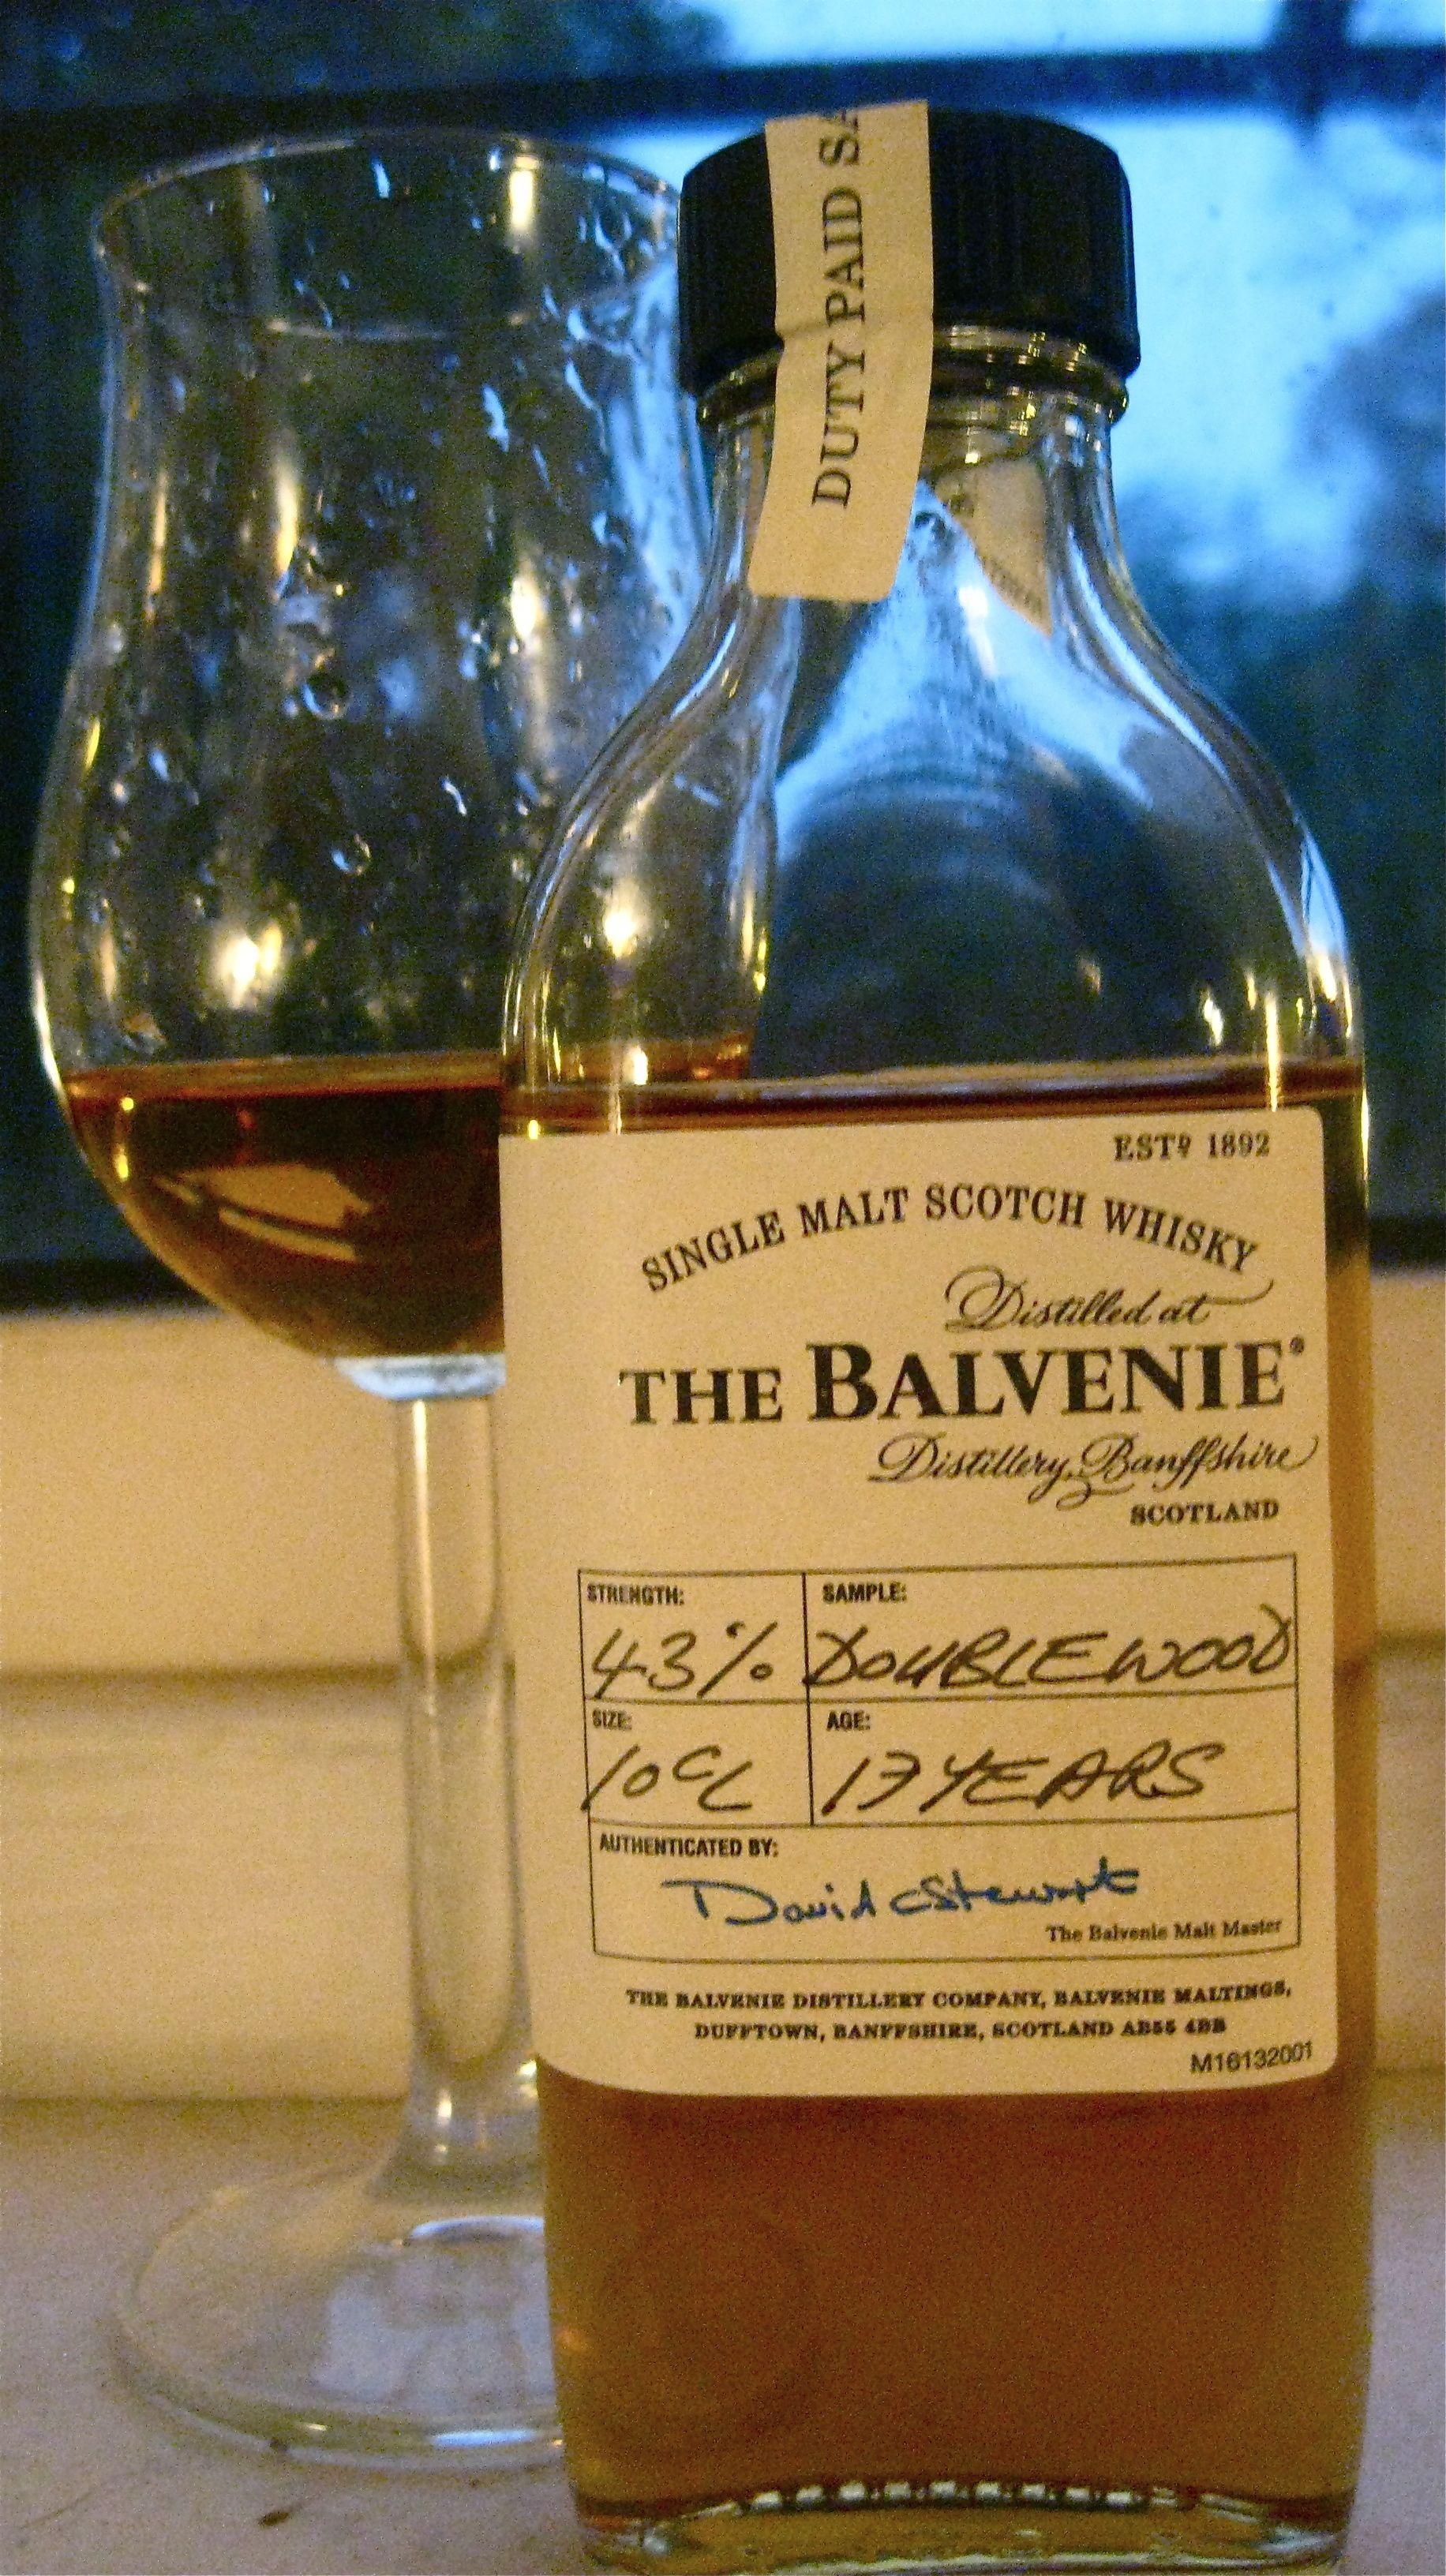 The Balvenie 2